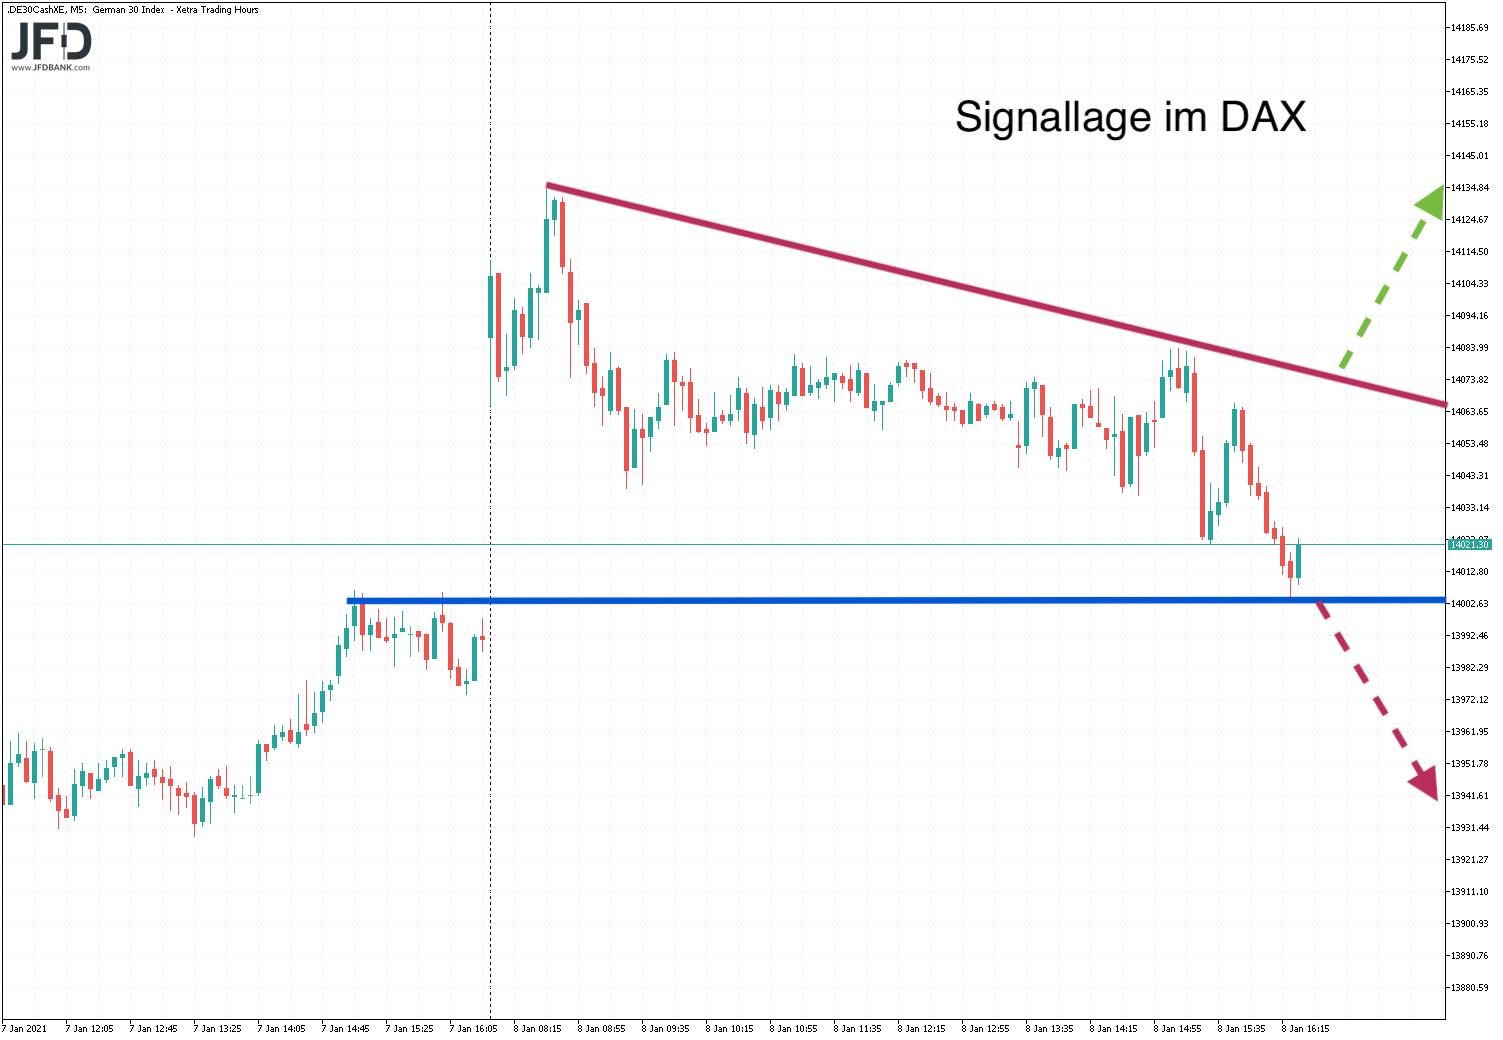 DAX-Signallage am Montag